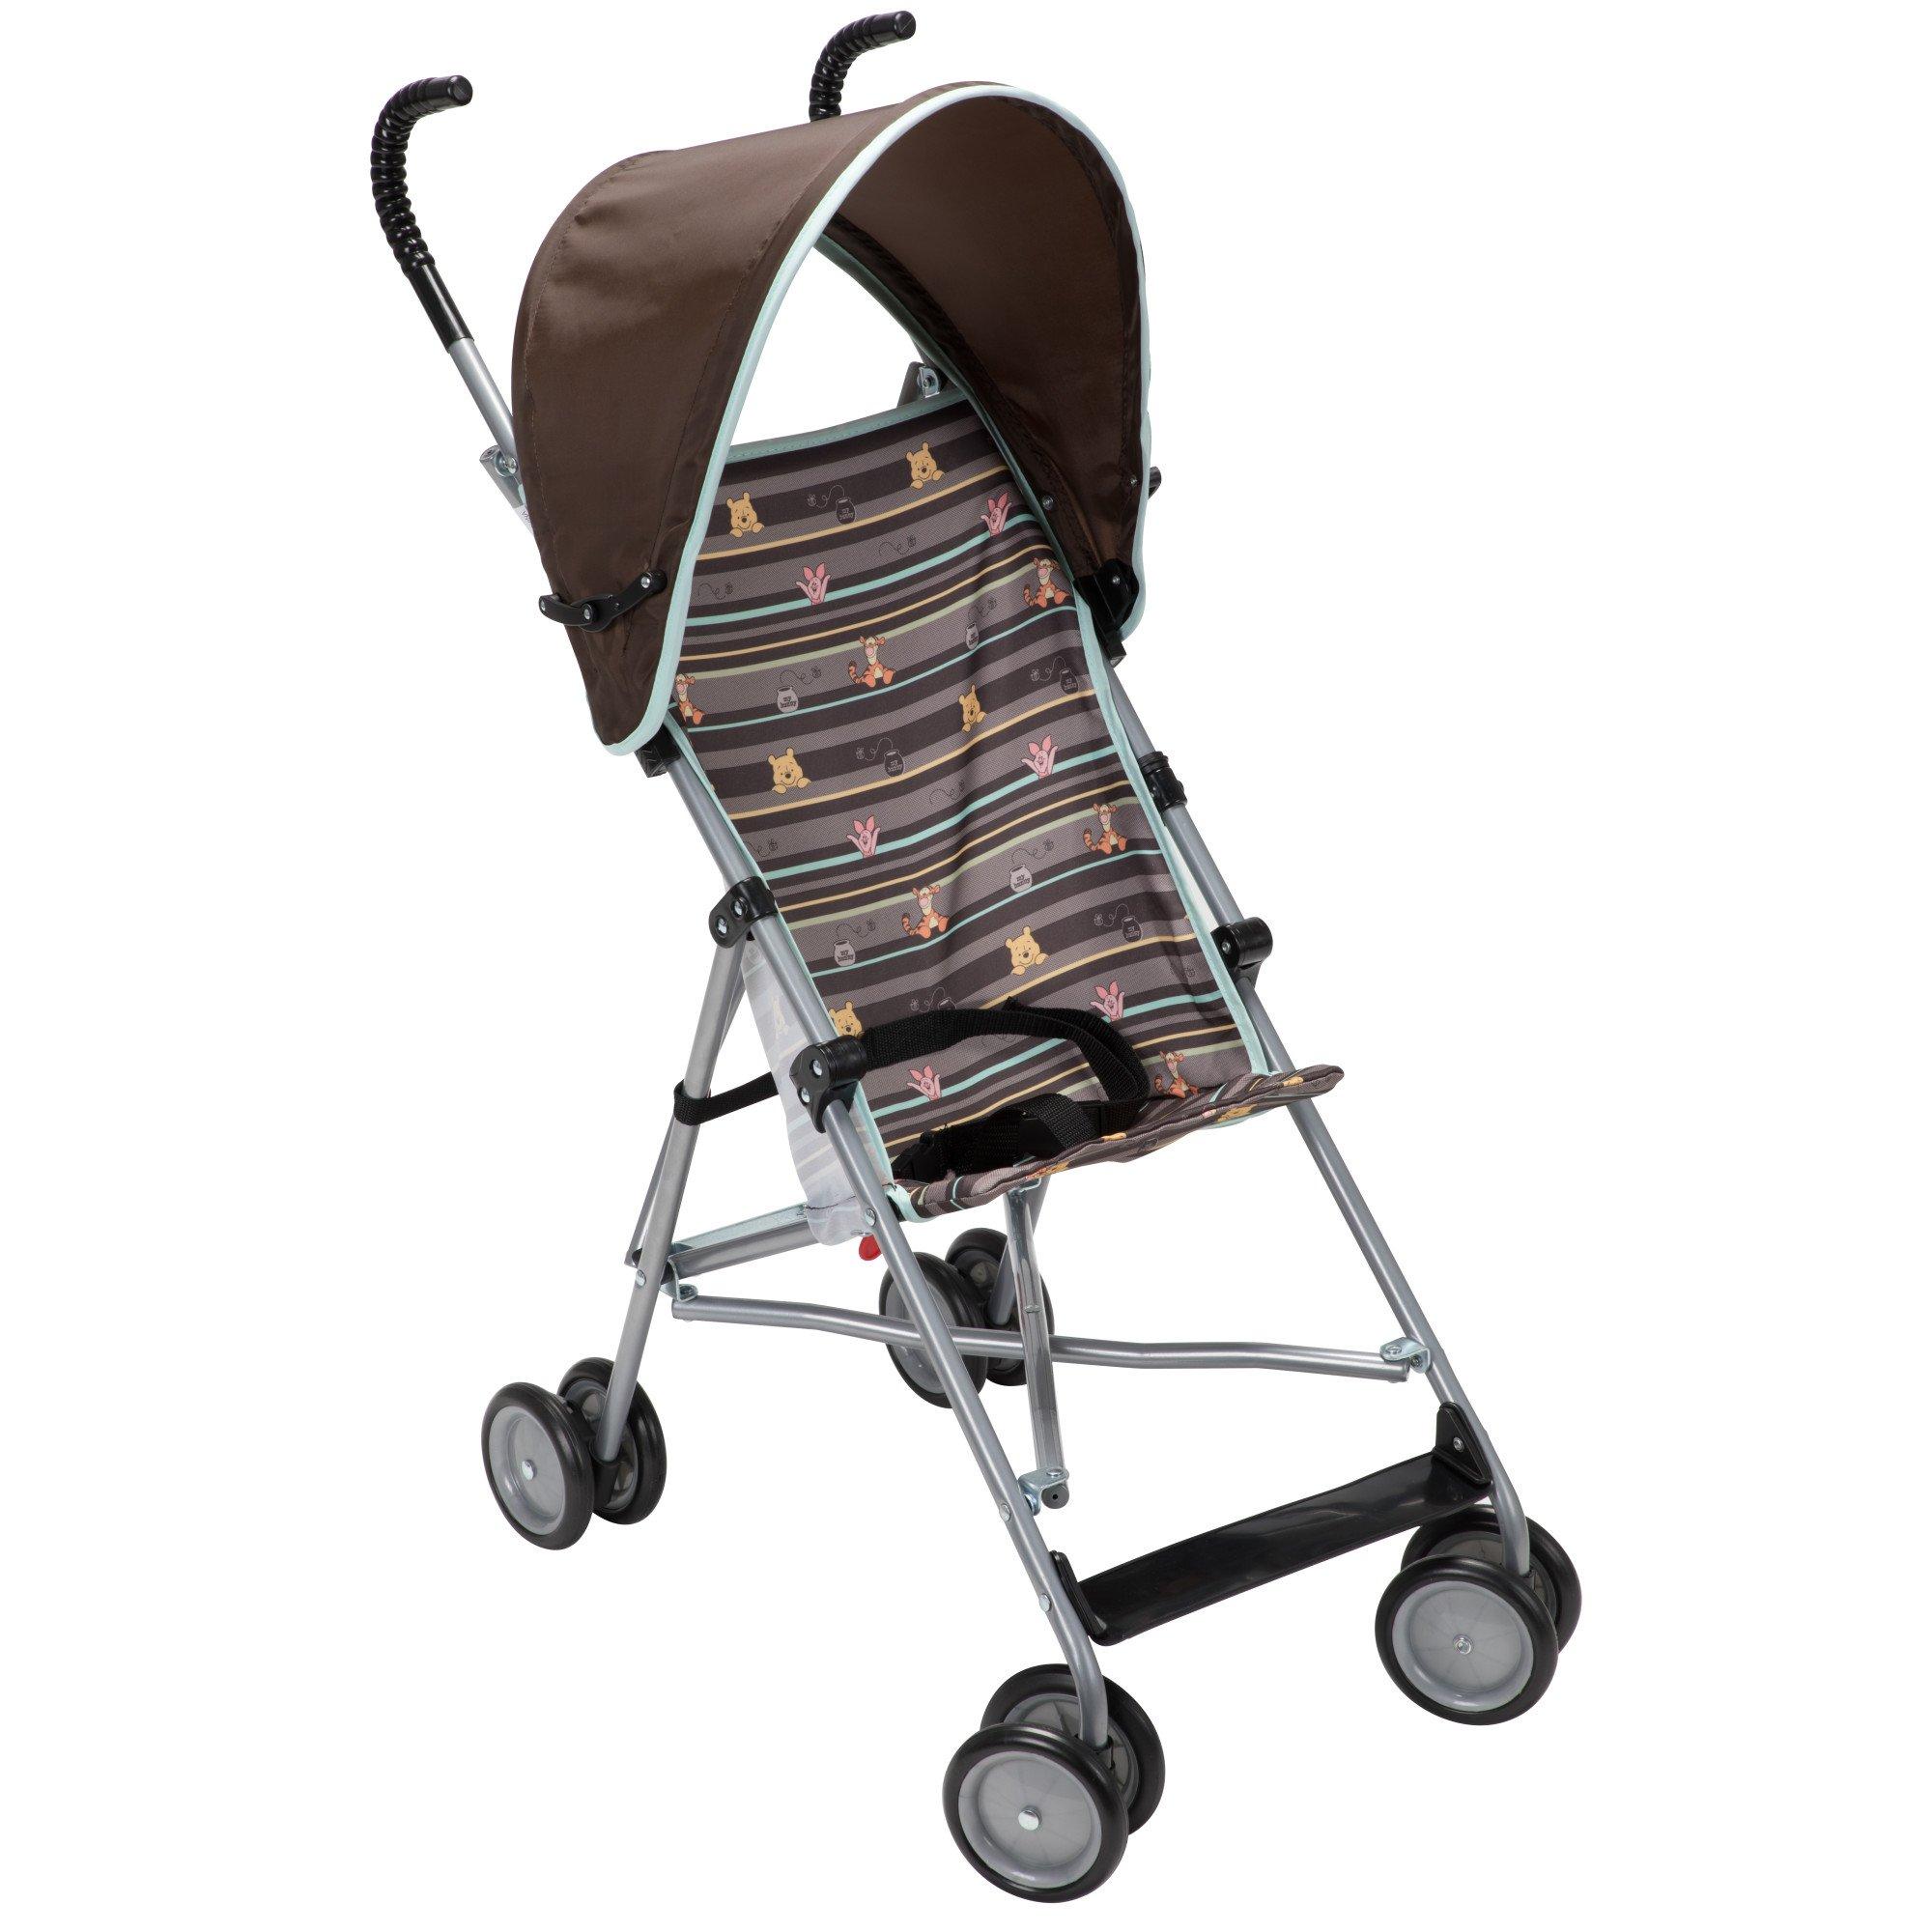 Amazon.com : Stroller Connectors : Baby Stroller